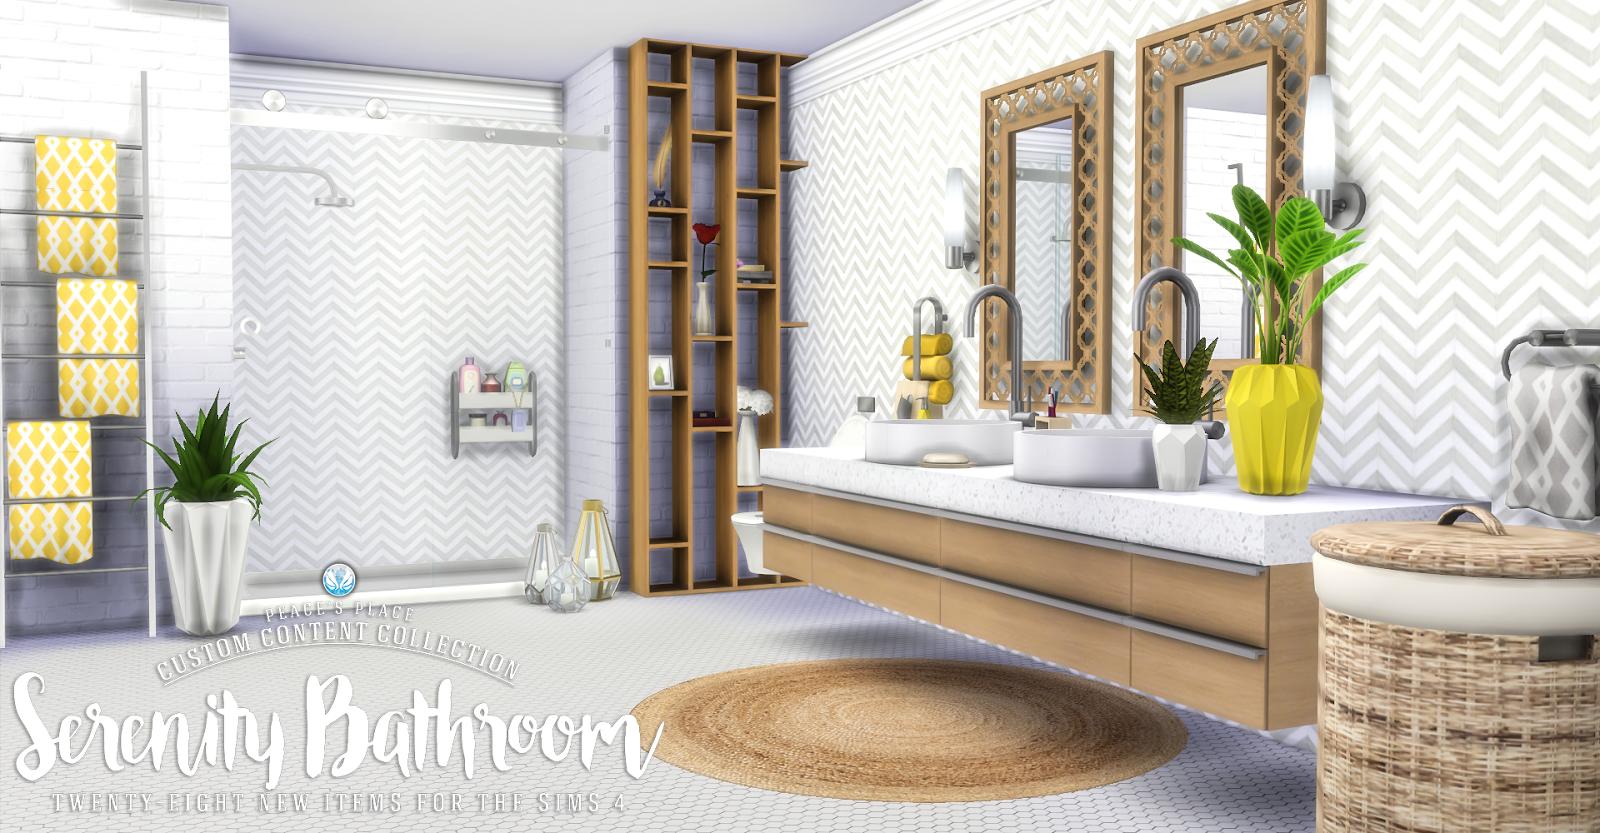 Simsational designs serenity bathroom set sims 4 cc for Bathroom ideas sims 4